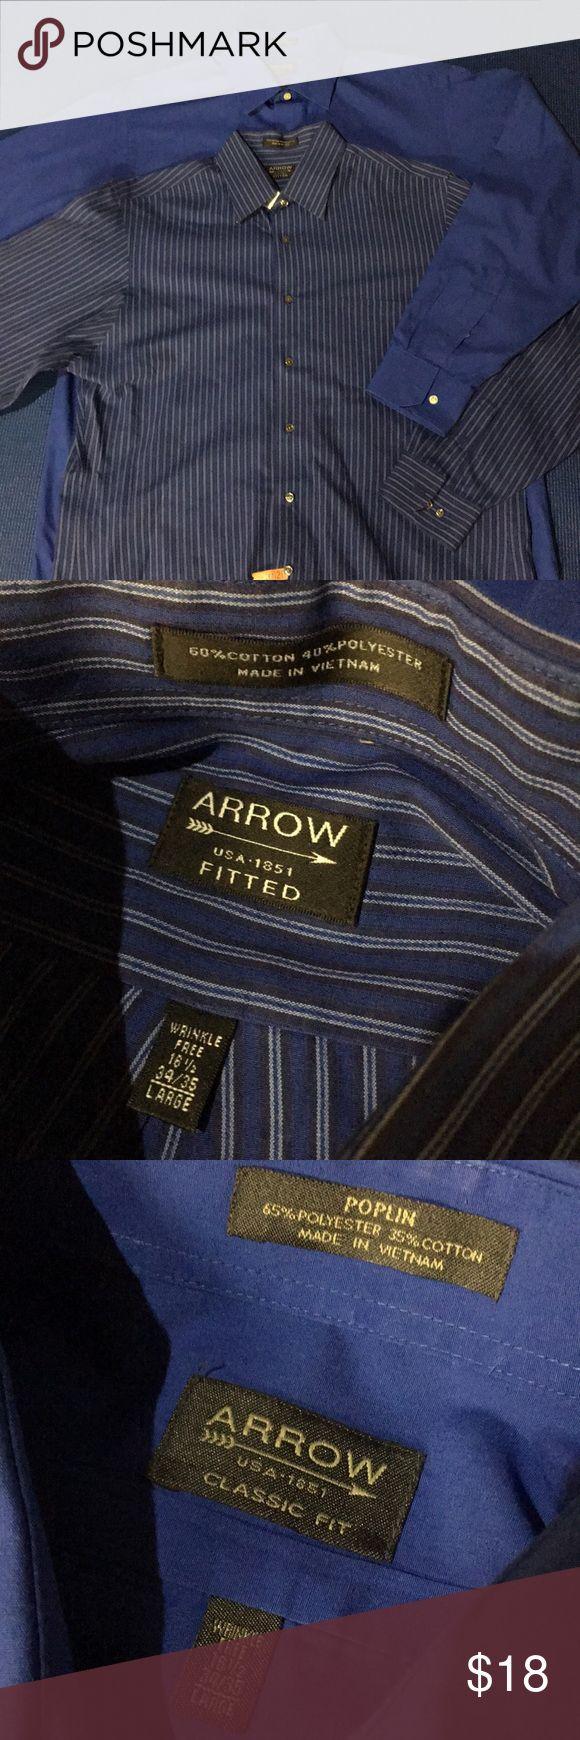 Men's Arrow Shirt Bundle Wrinkle free. 18 1/2, 34/35 size large. Freshly dry cleaned. Arrow Shirts Dress Shirts